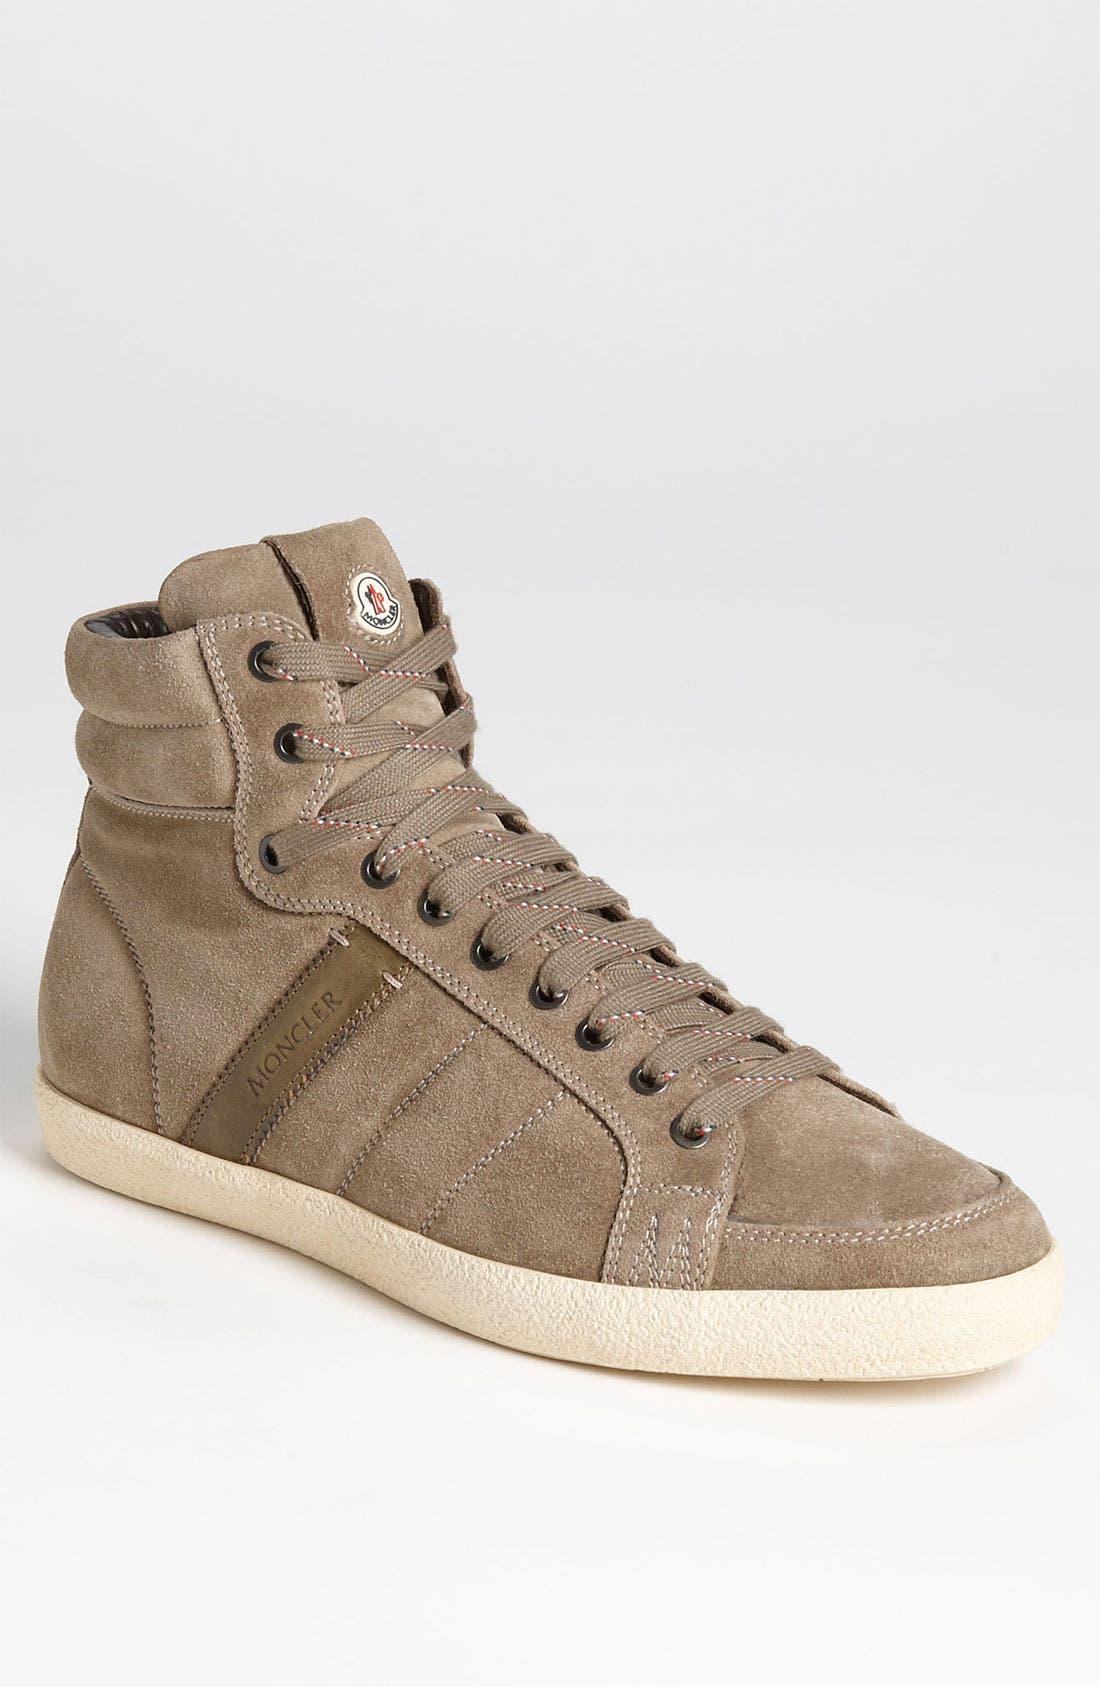 Main Image - Moncler 'Lyon' Suede Sneaker (Men)